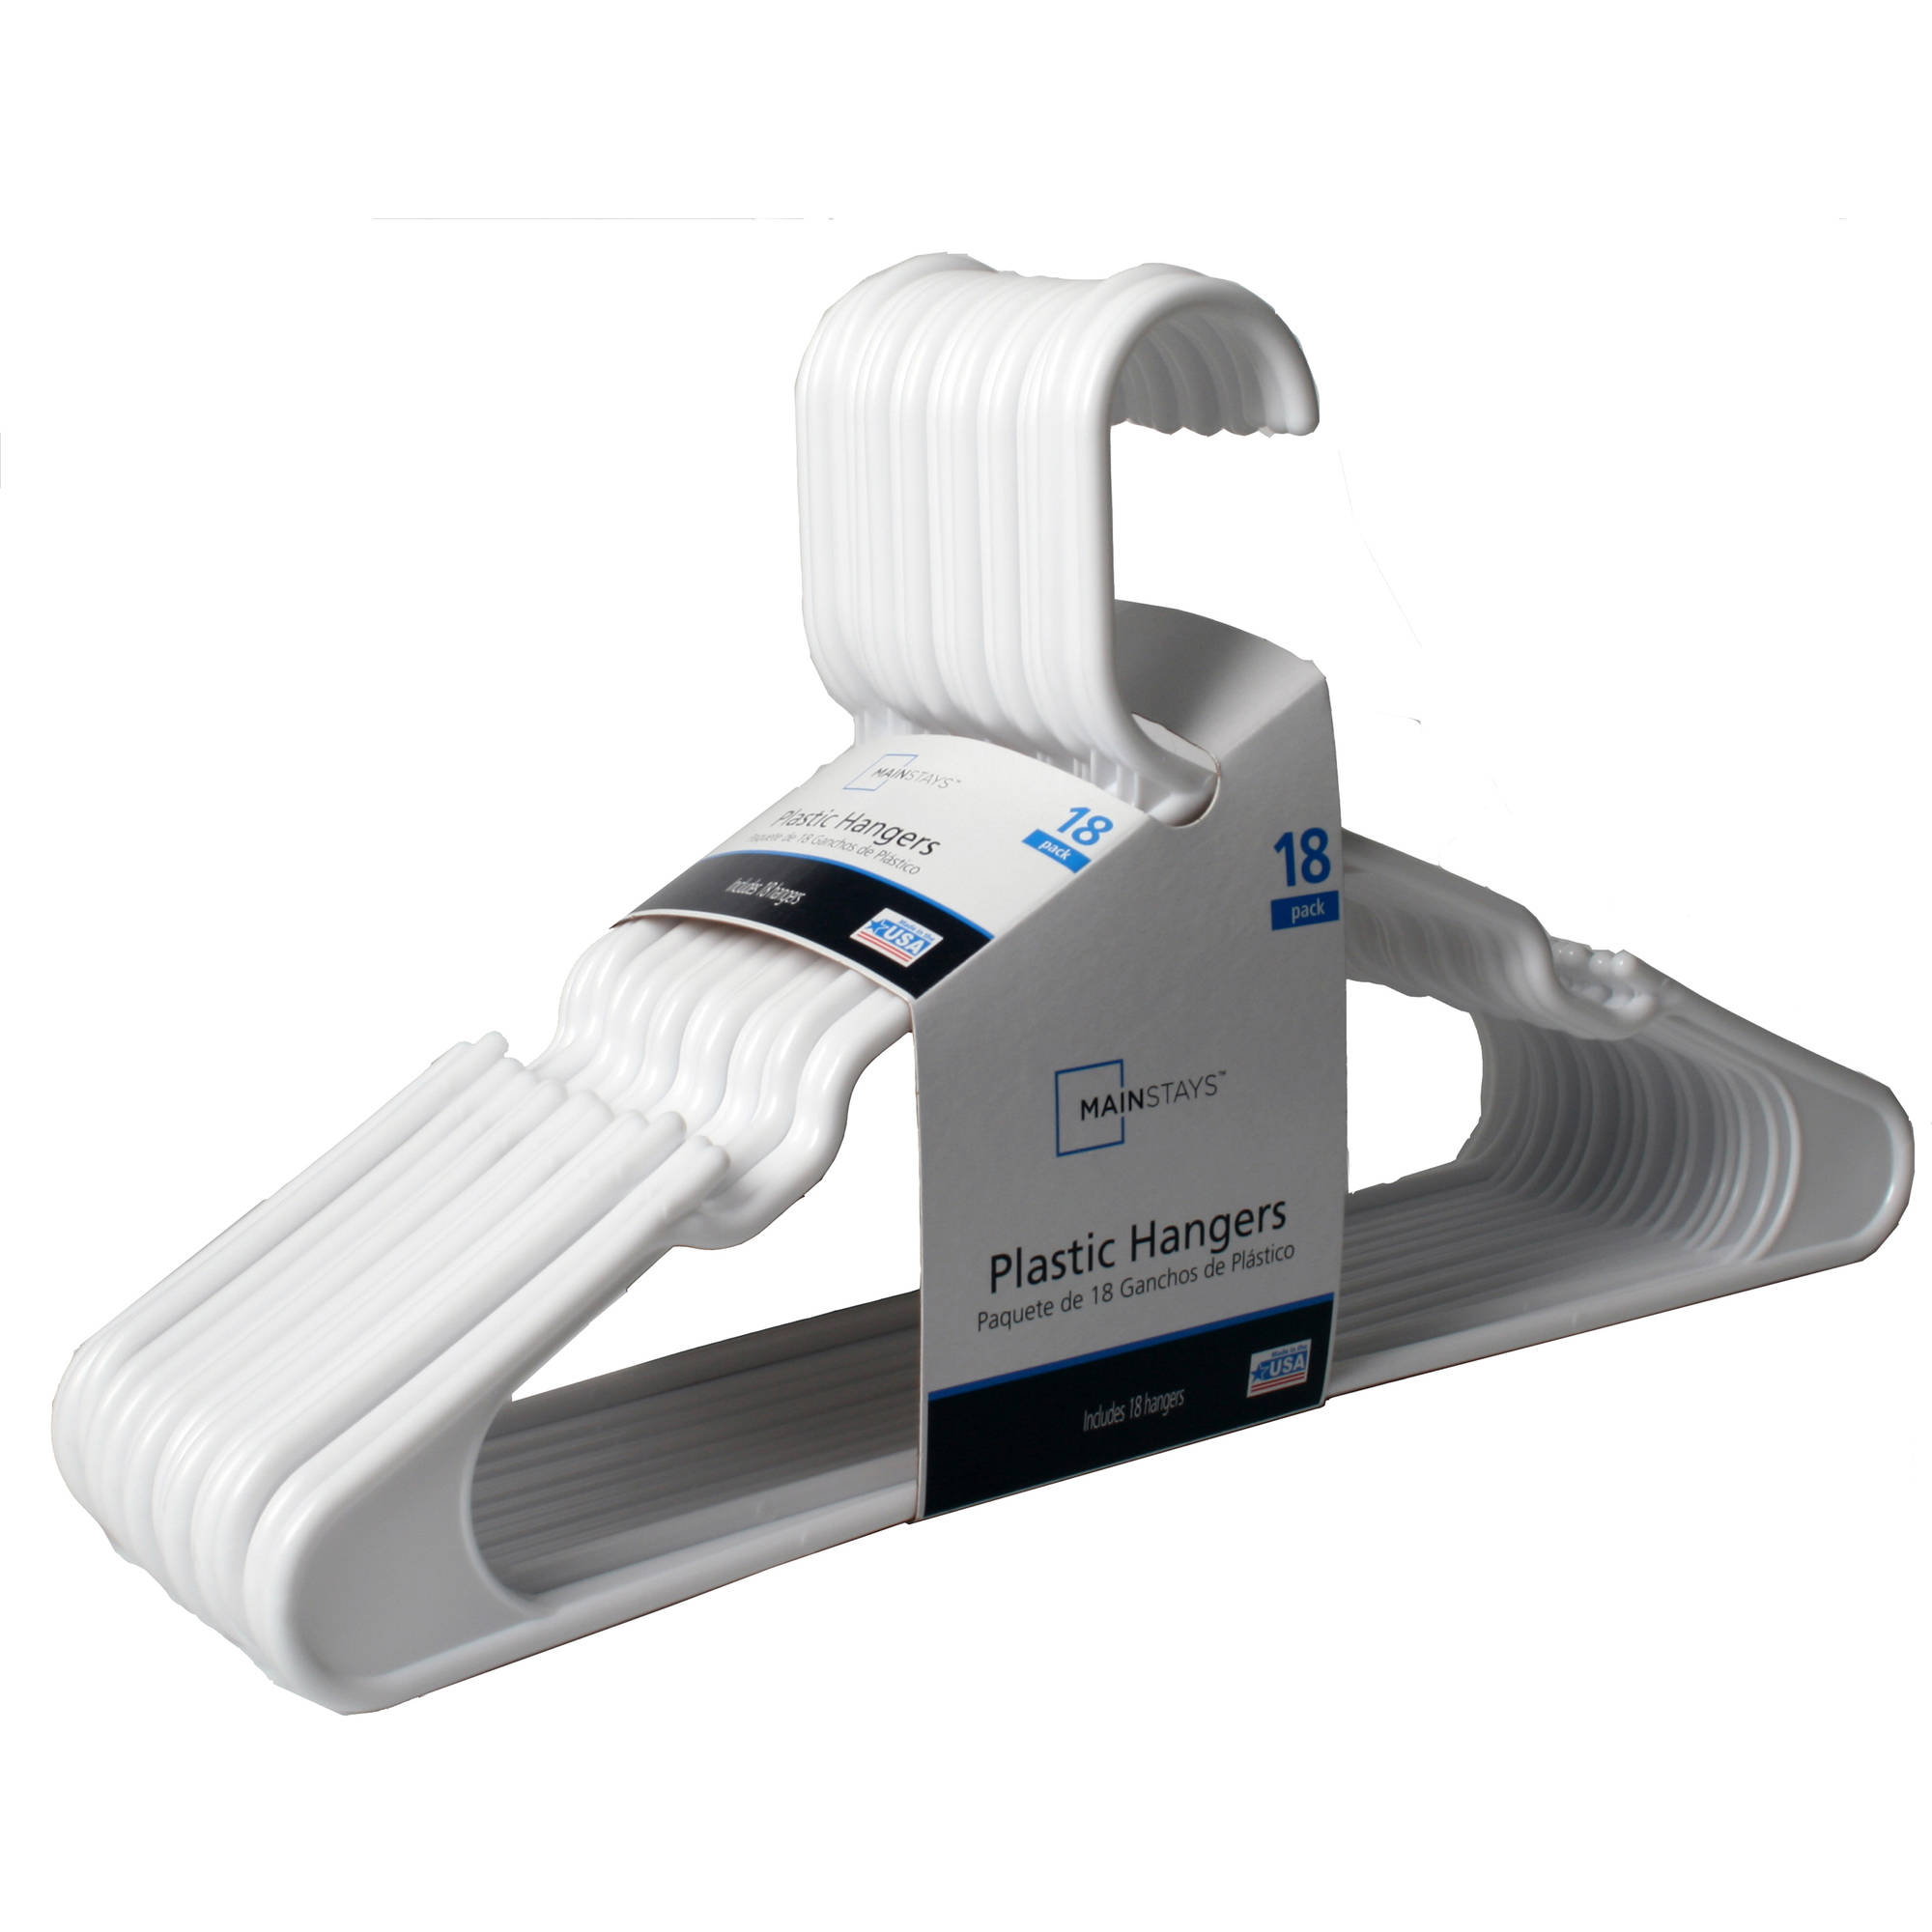 Mainstays 18-Pack Hanger, White by Merrick Engineering